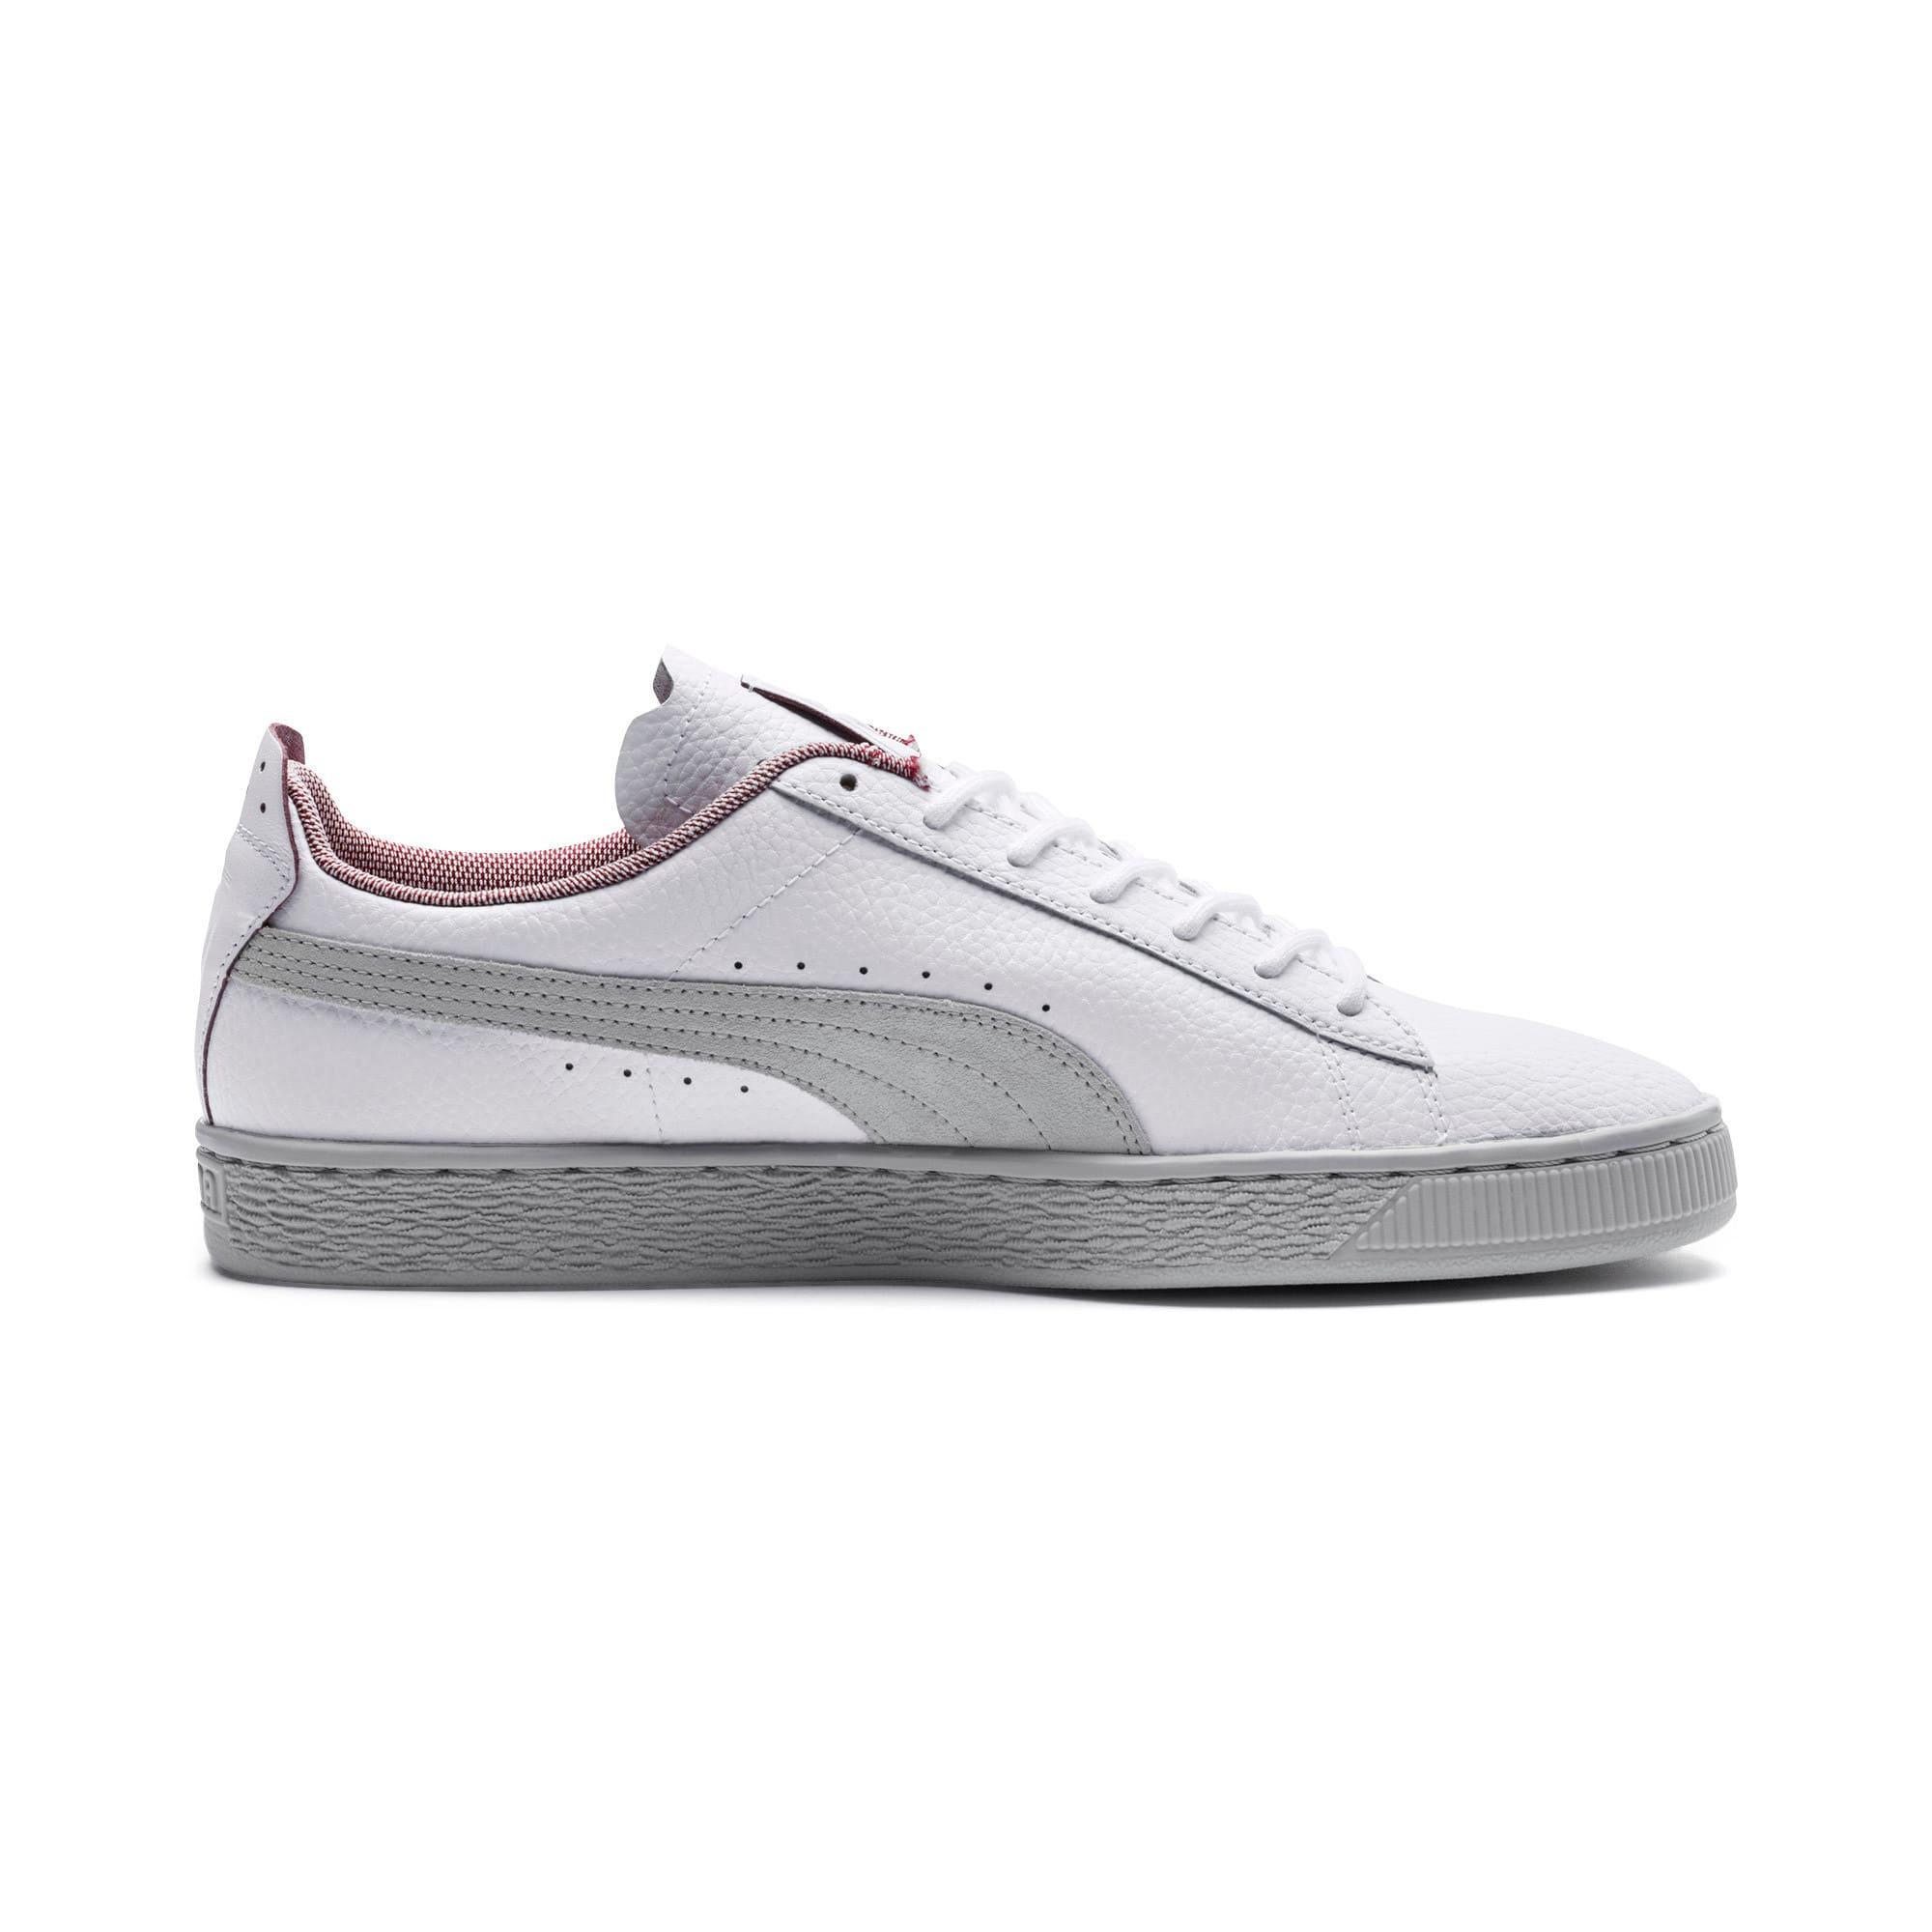 Thumbnail 5 of Scuderia Ferrari Basket Sneakers, Puma White-Glacier Gray, medium